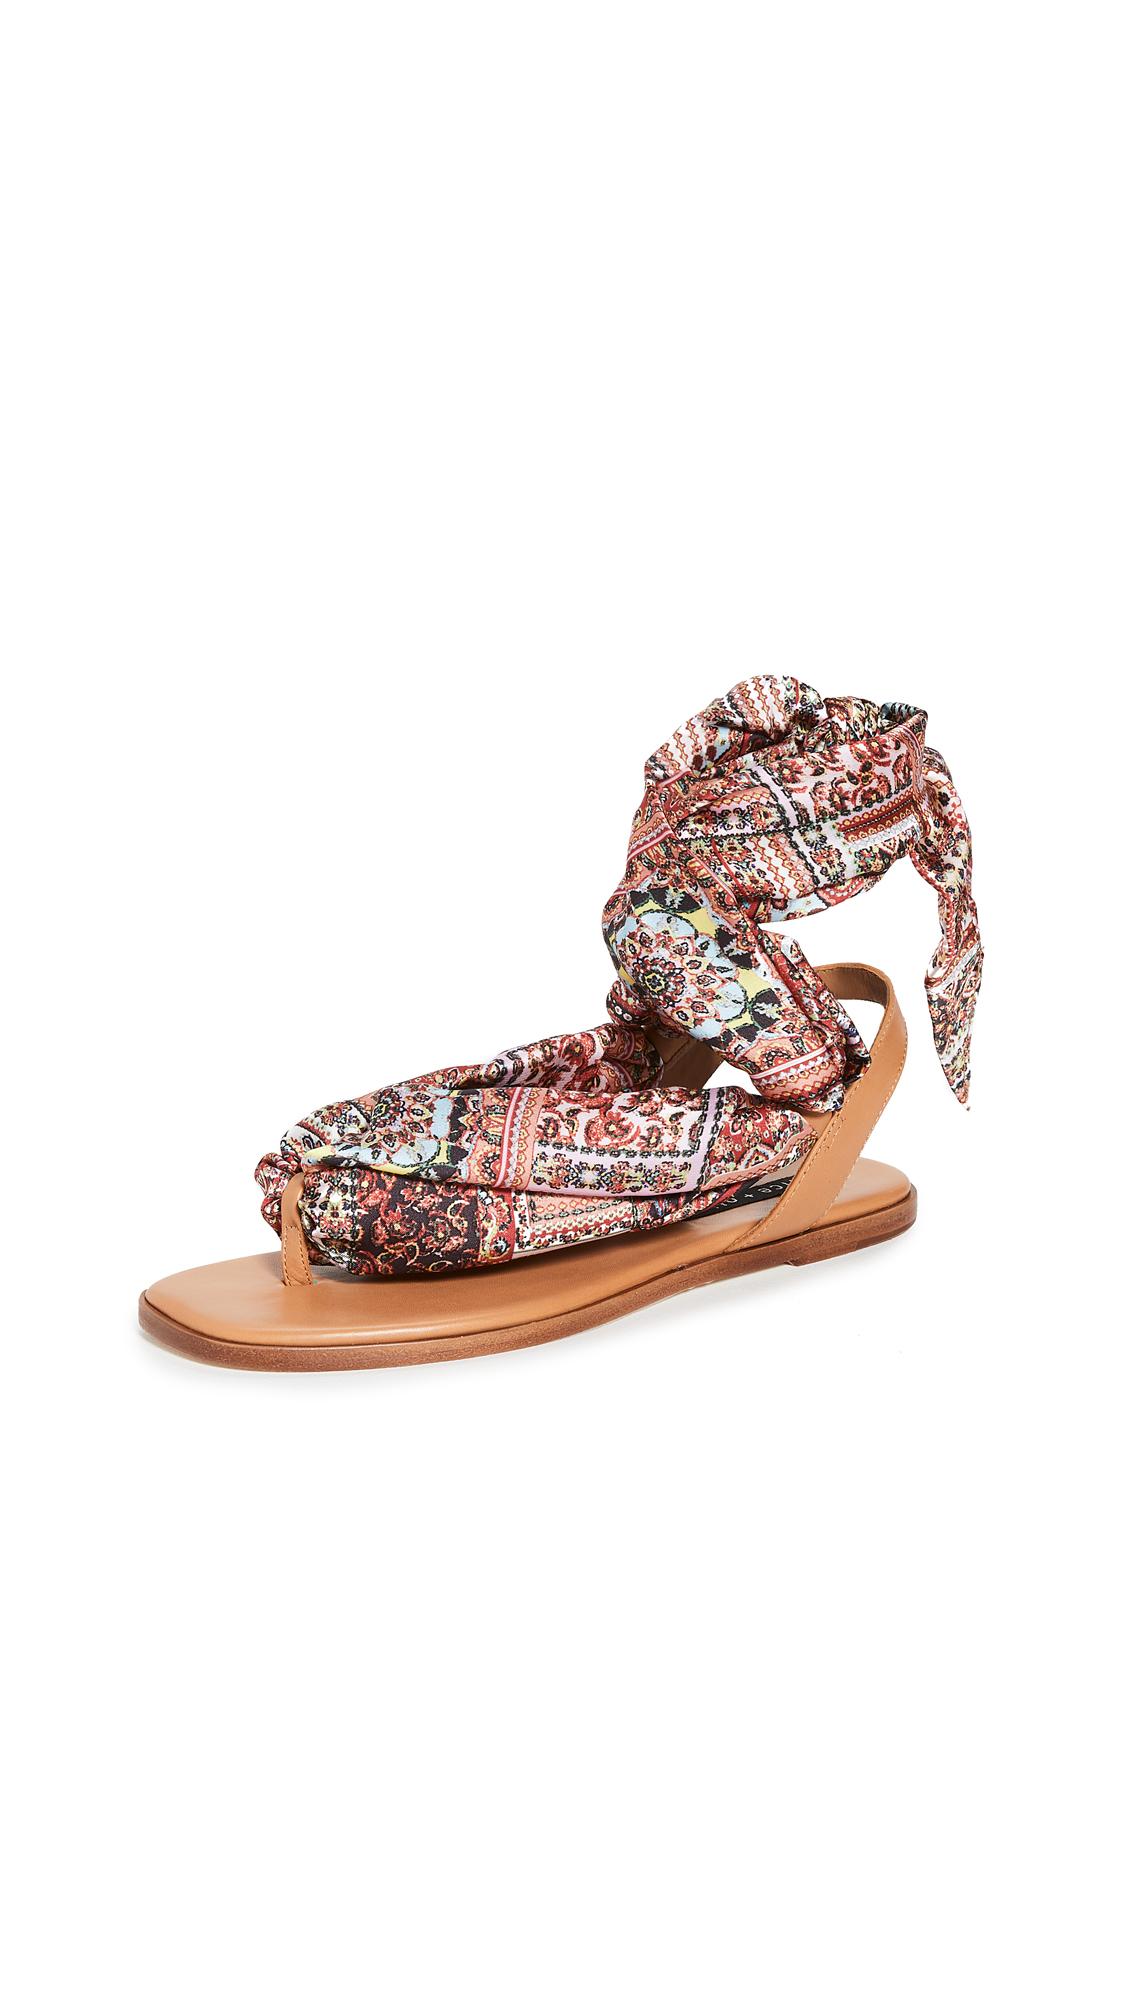 Buy alice + olivia Caliea Wrap Sandals online, shop alice + olivia